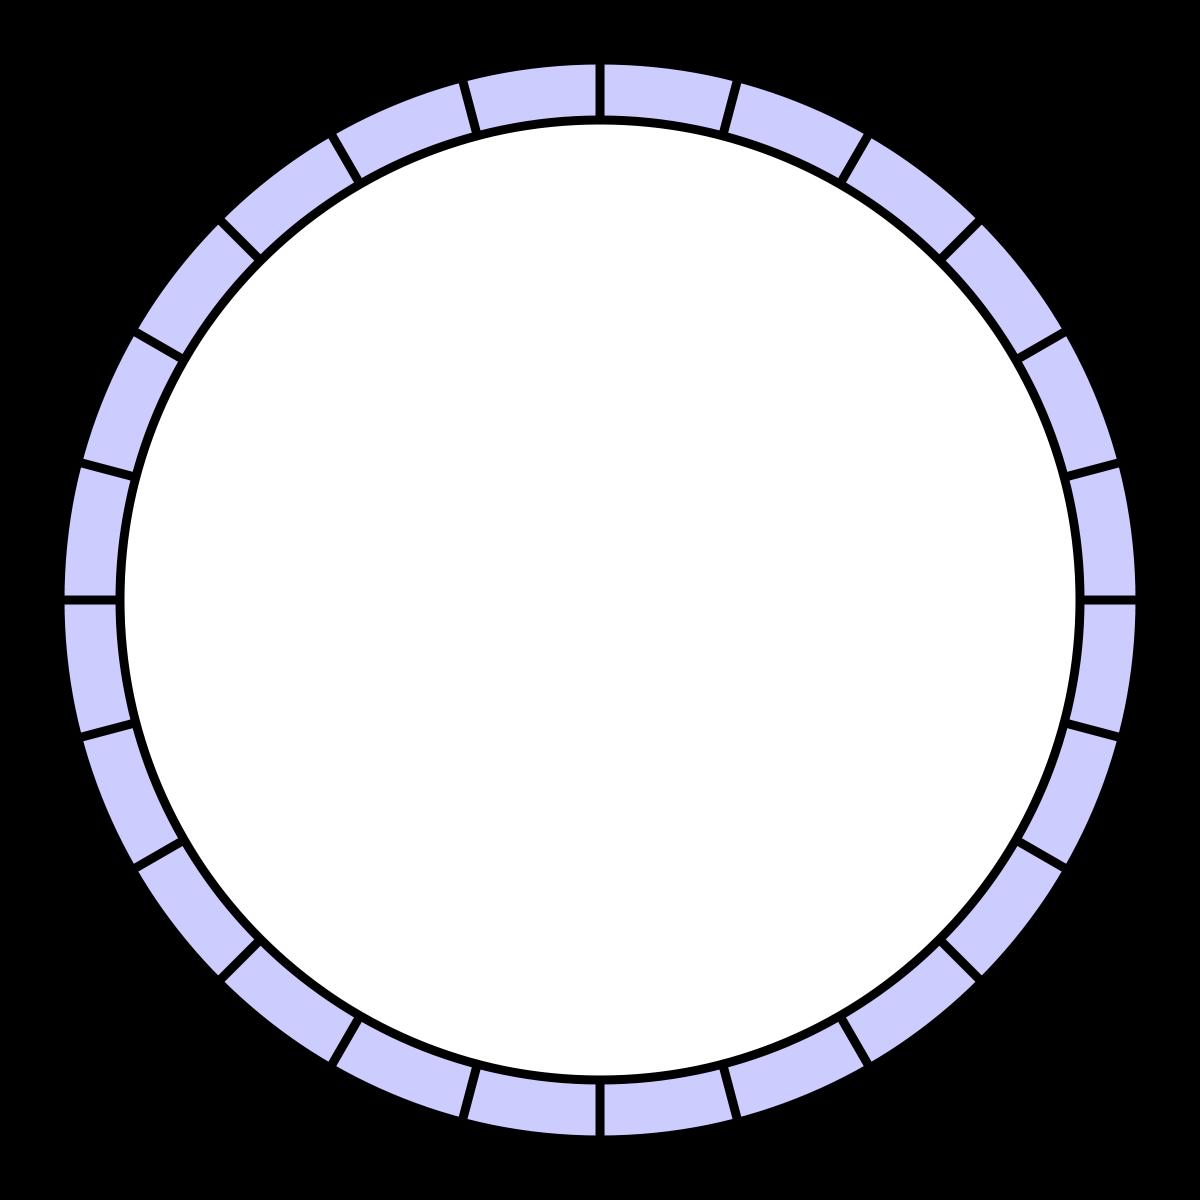 Circle,Clip art,Oval #4463780.